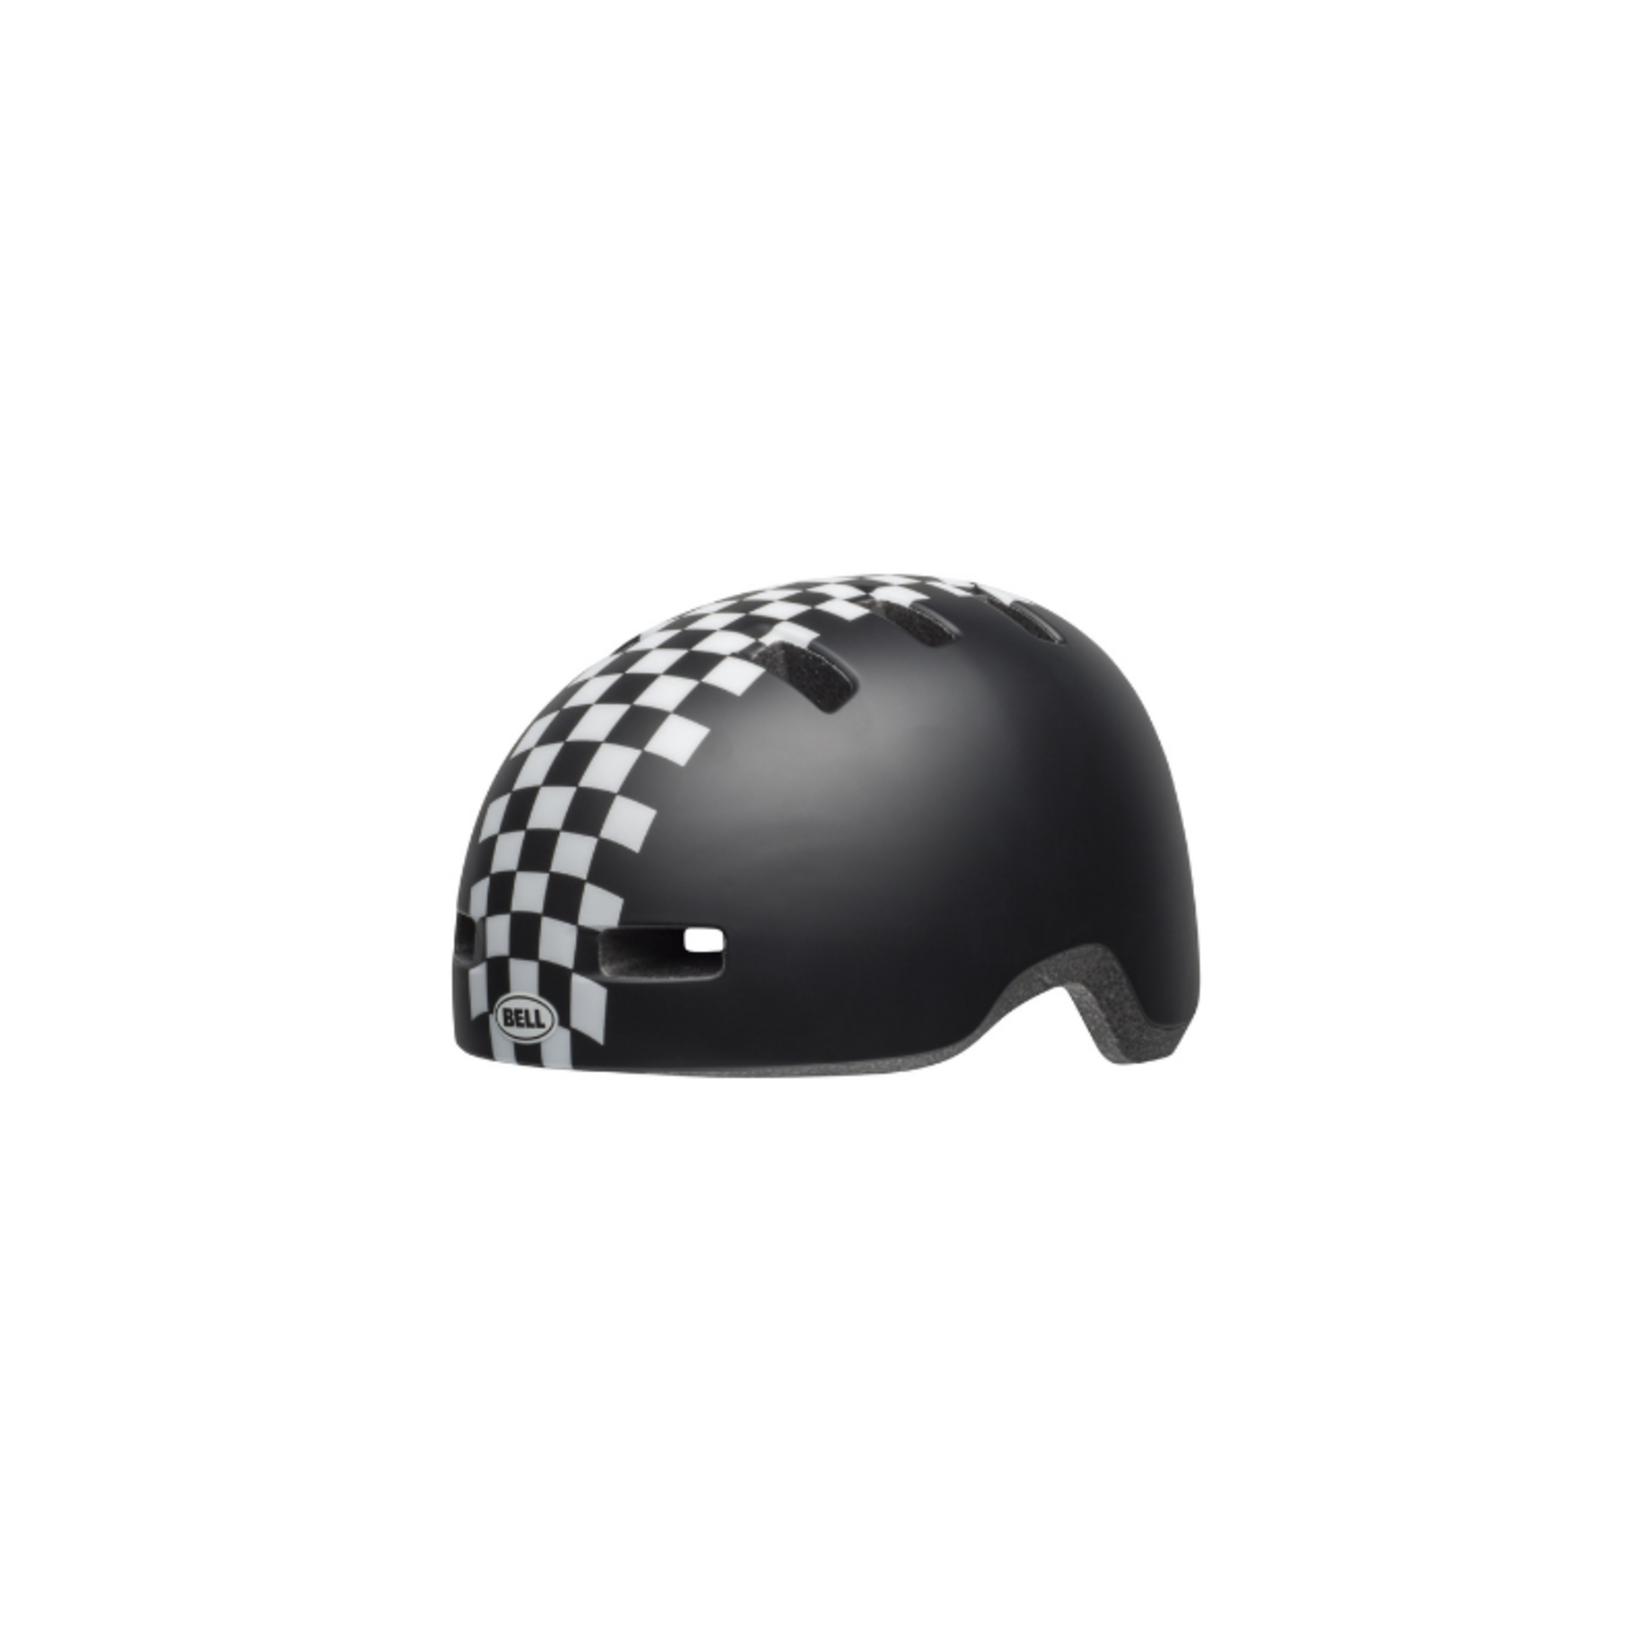 Bell Lil Ripper Youth Helmet